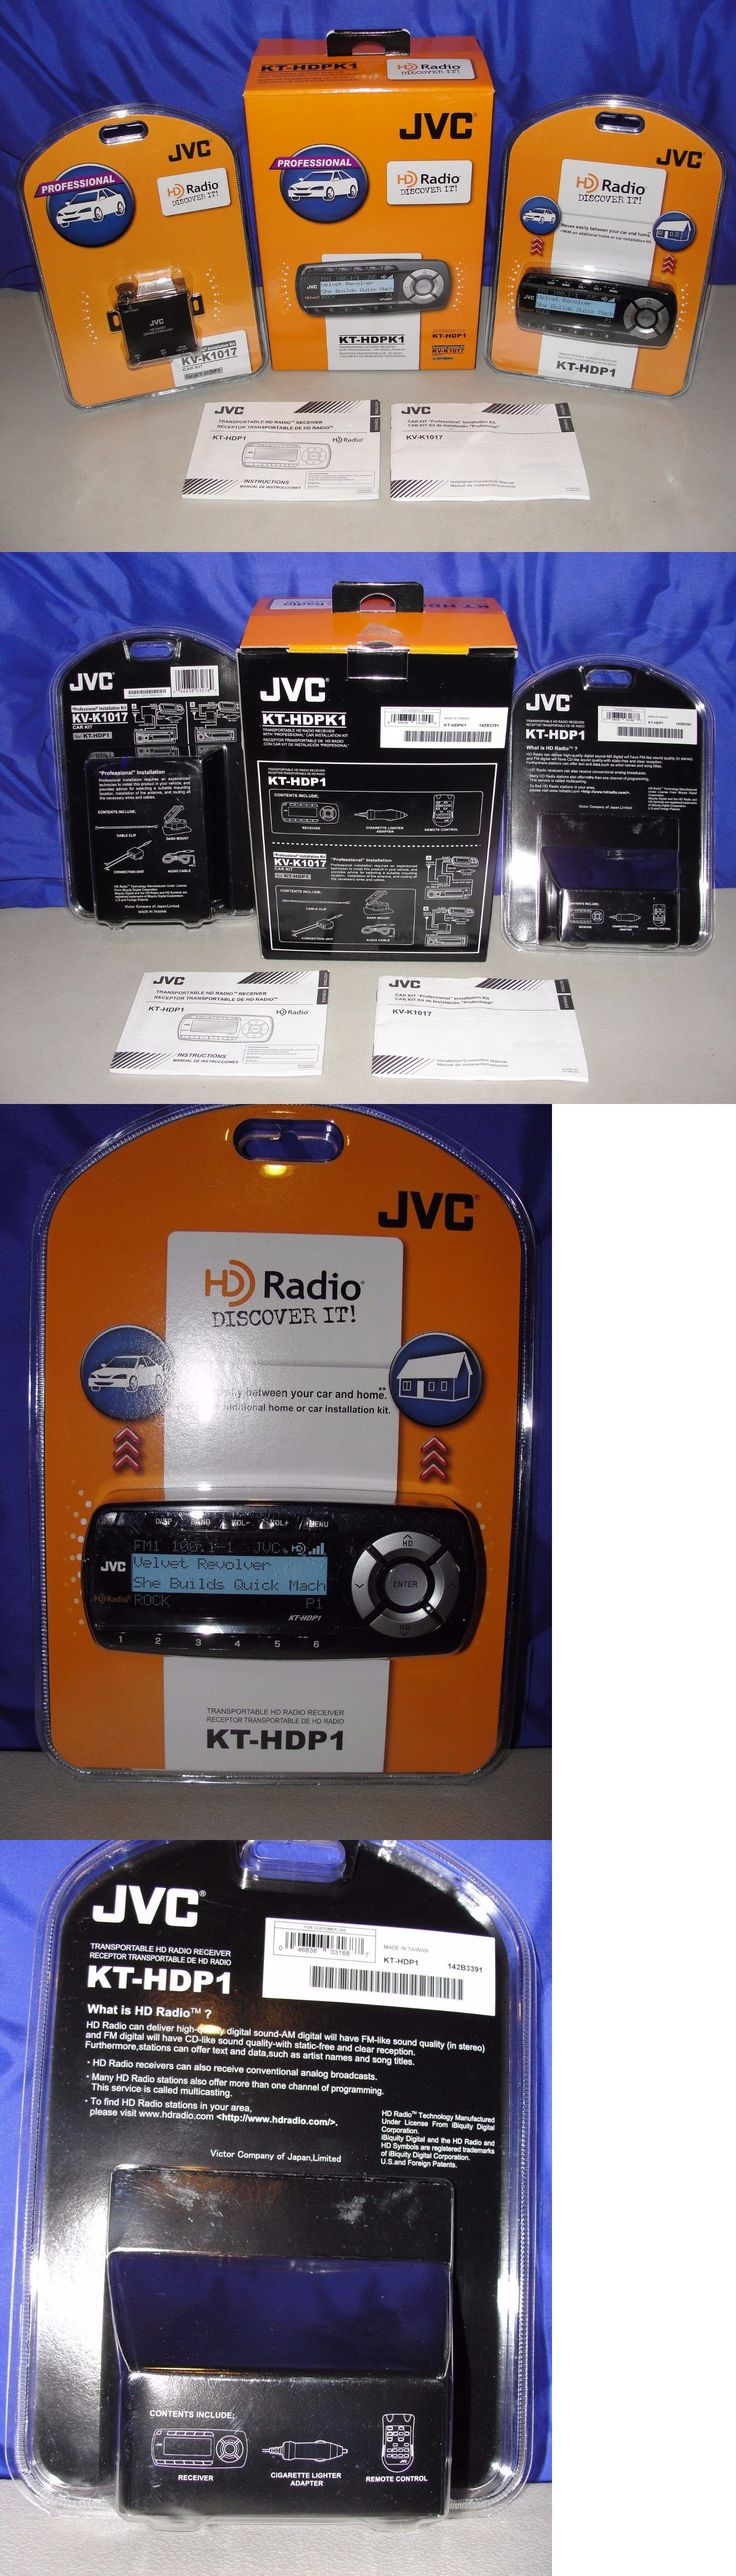 Other car audio jvc transportable hd radio receiver kt hdp1 installation kit